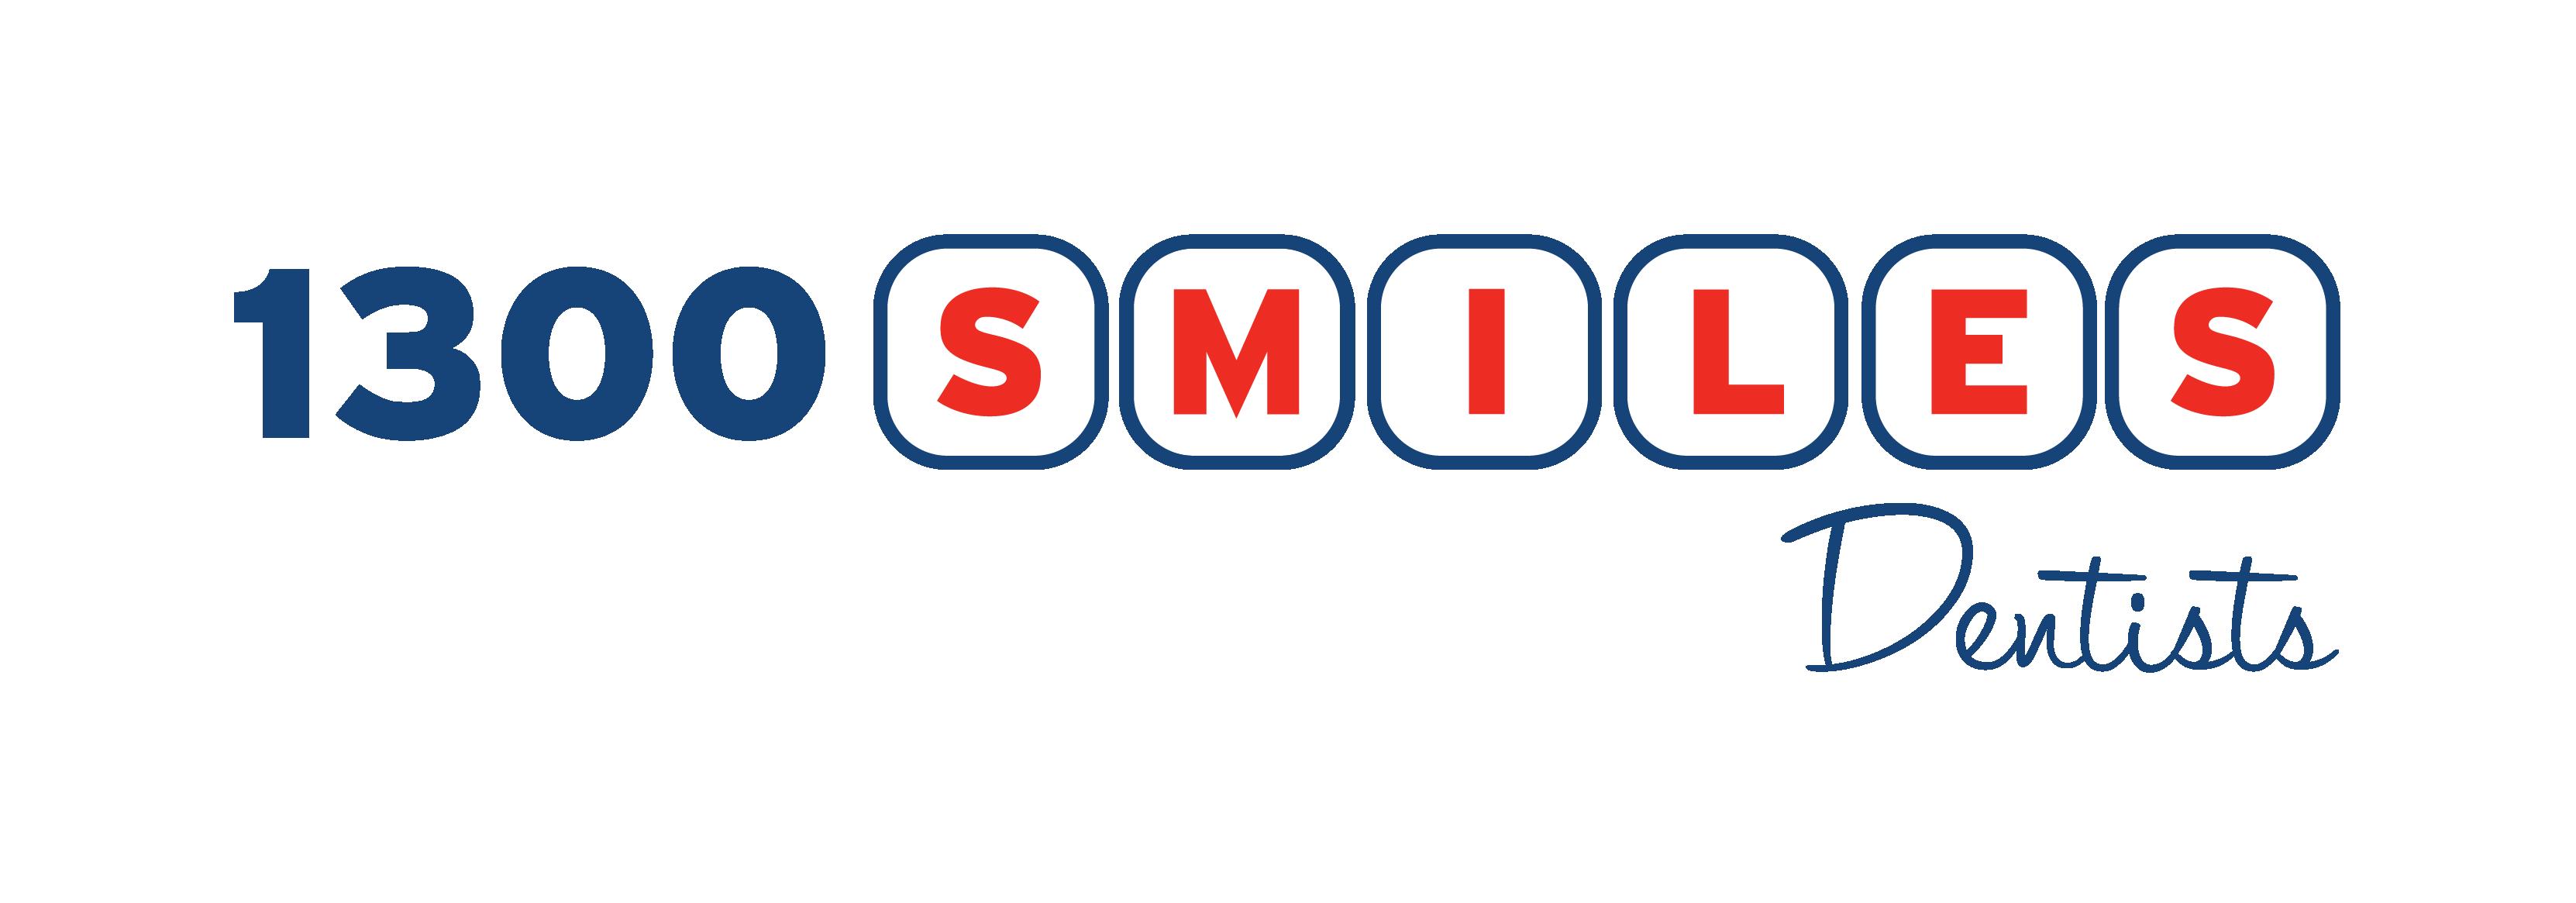 1300SMILES Ltd Logo